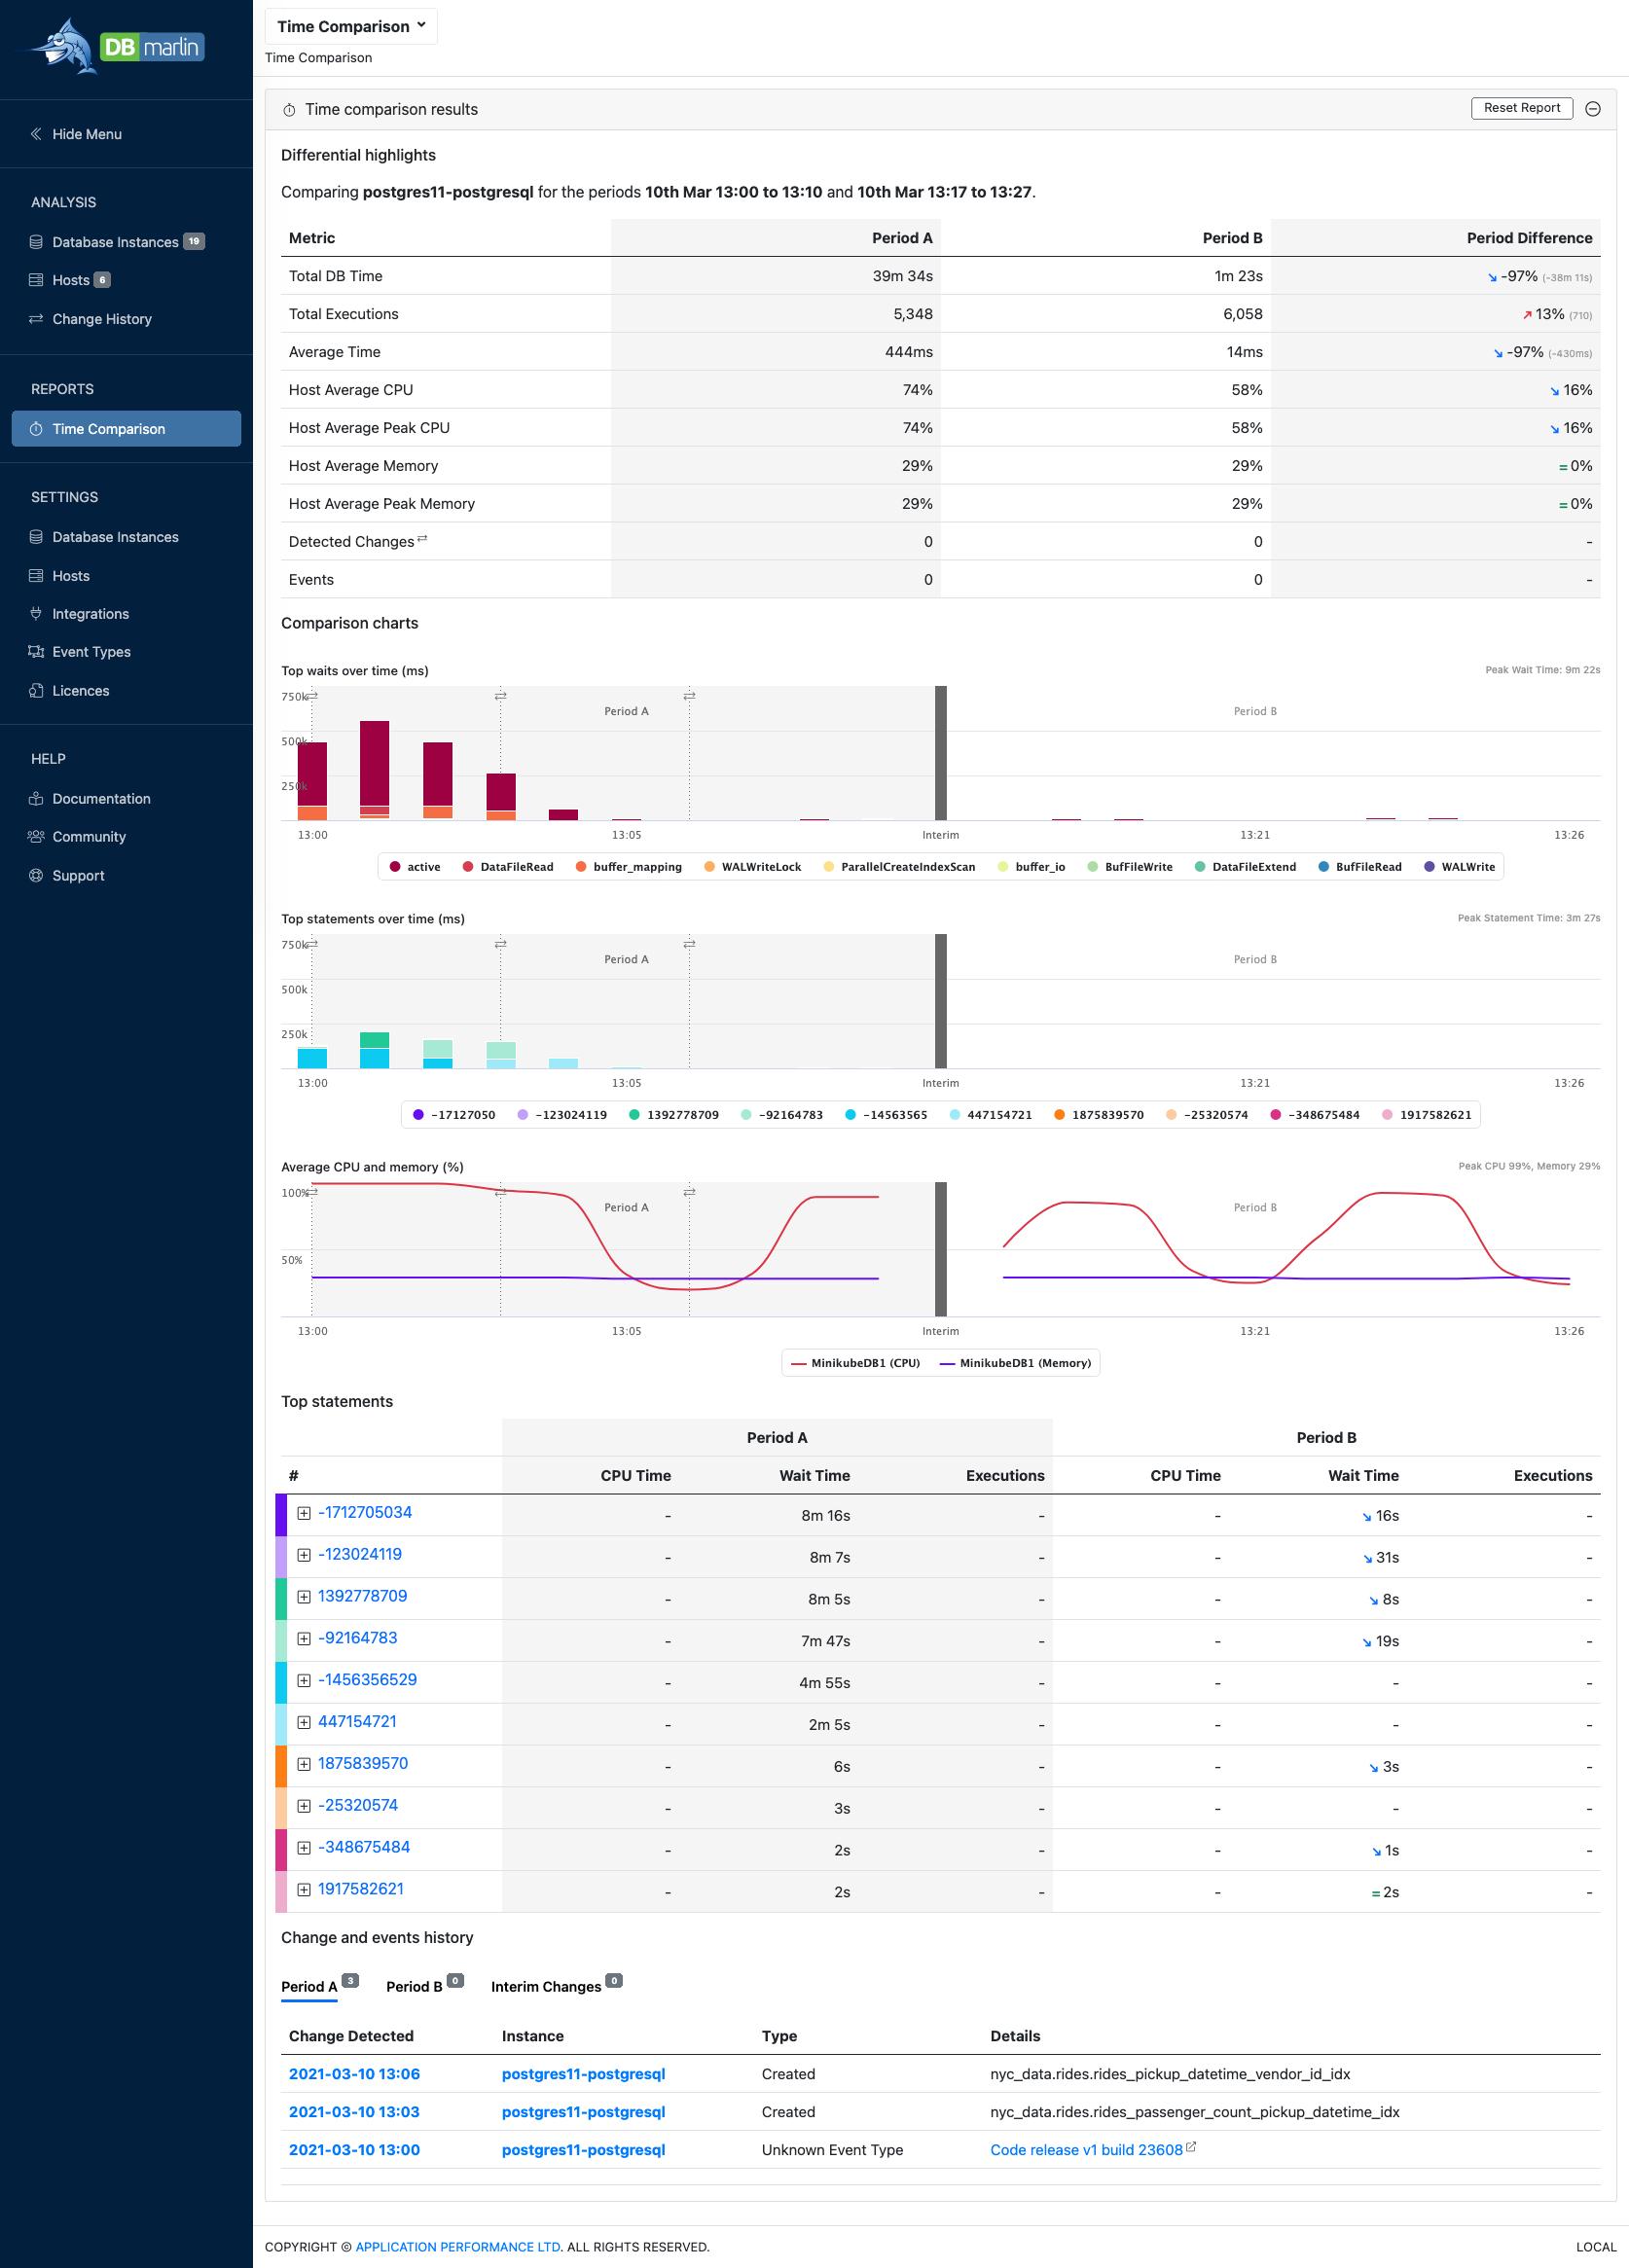 https://d33wubrfki0l68.cloudfront.net/bafd5ec37adca52dac5641301a0bd2ac265a8d3b/eb661/img/time-comparison-report.jpg